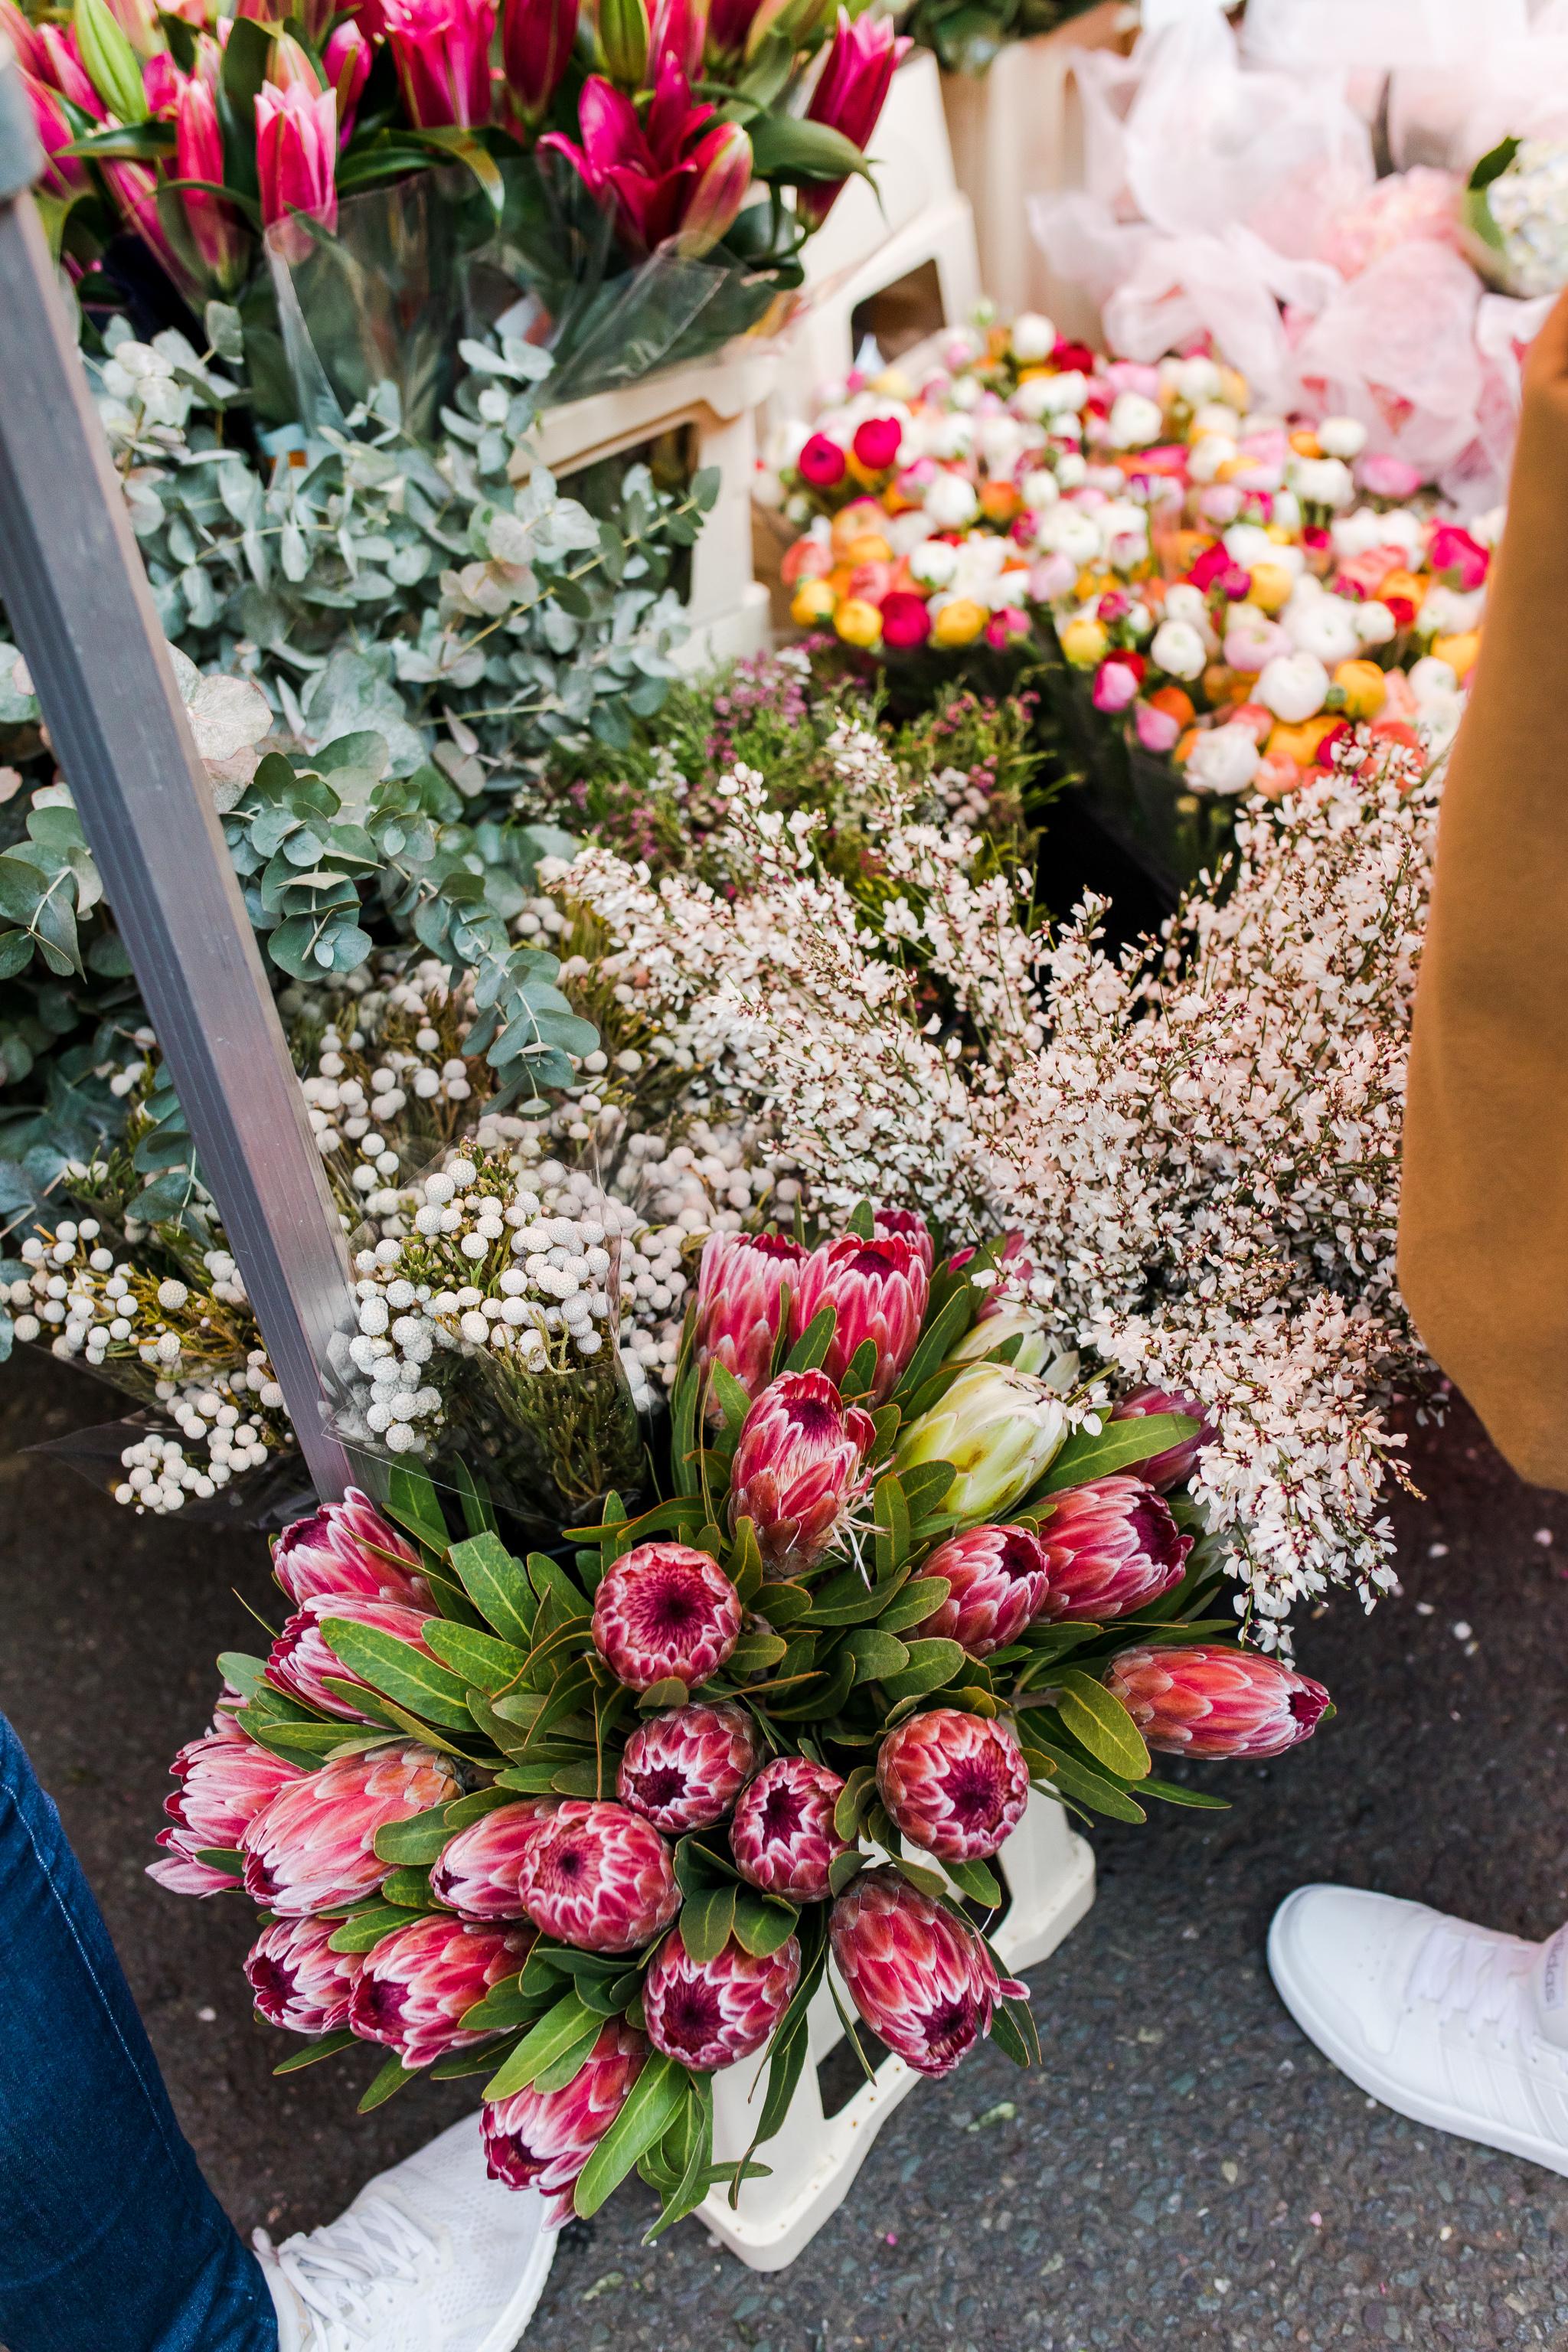 Columbia Road Flower Market Close Up Flowers.jpg